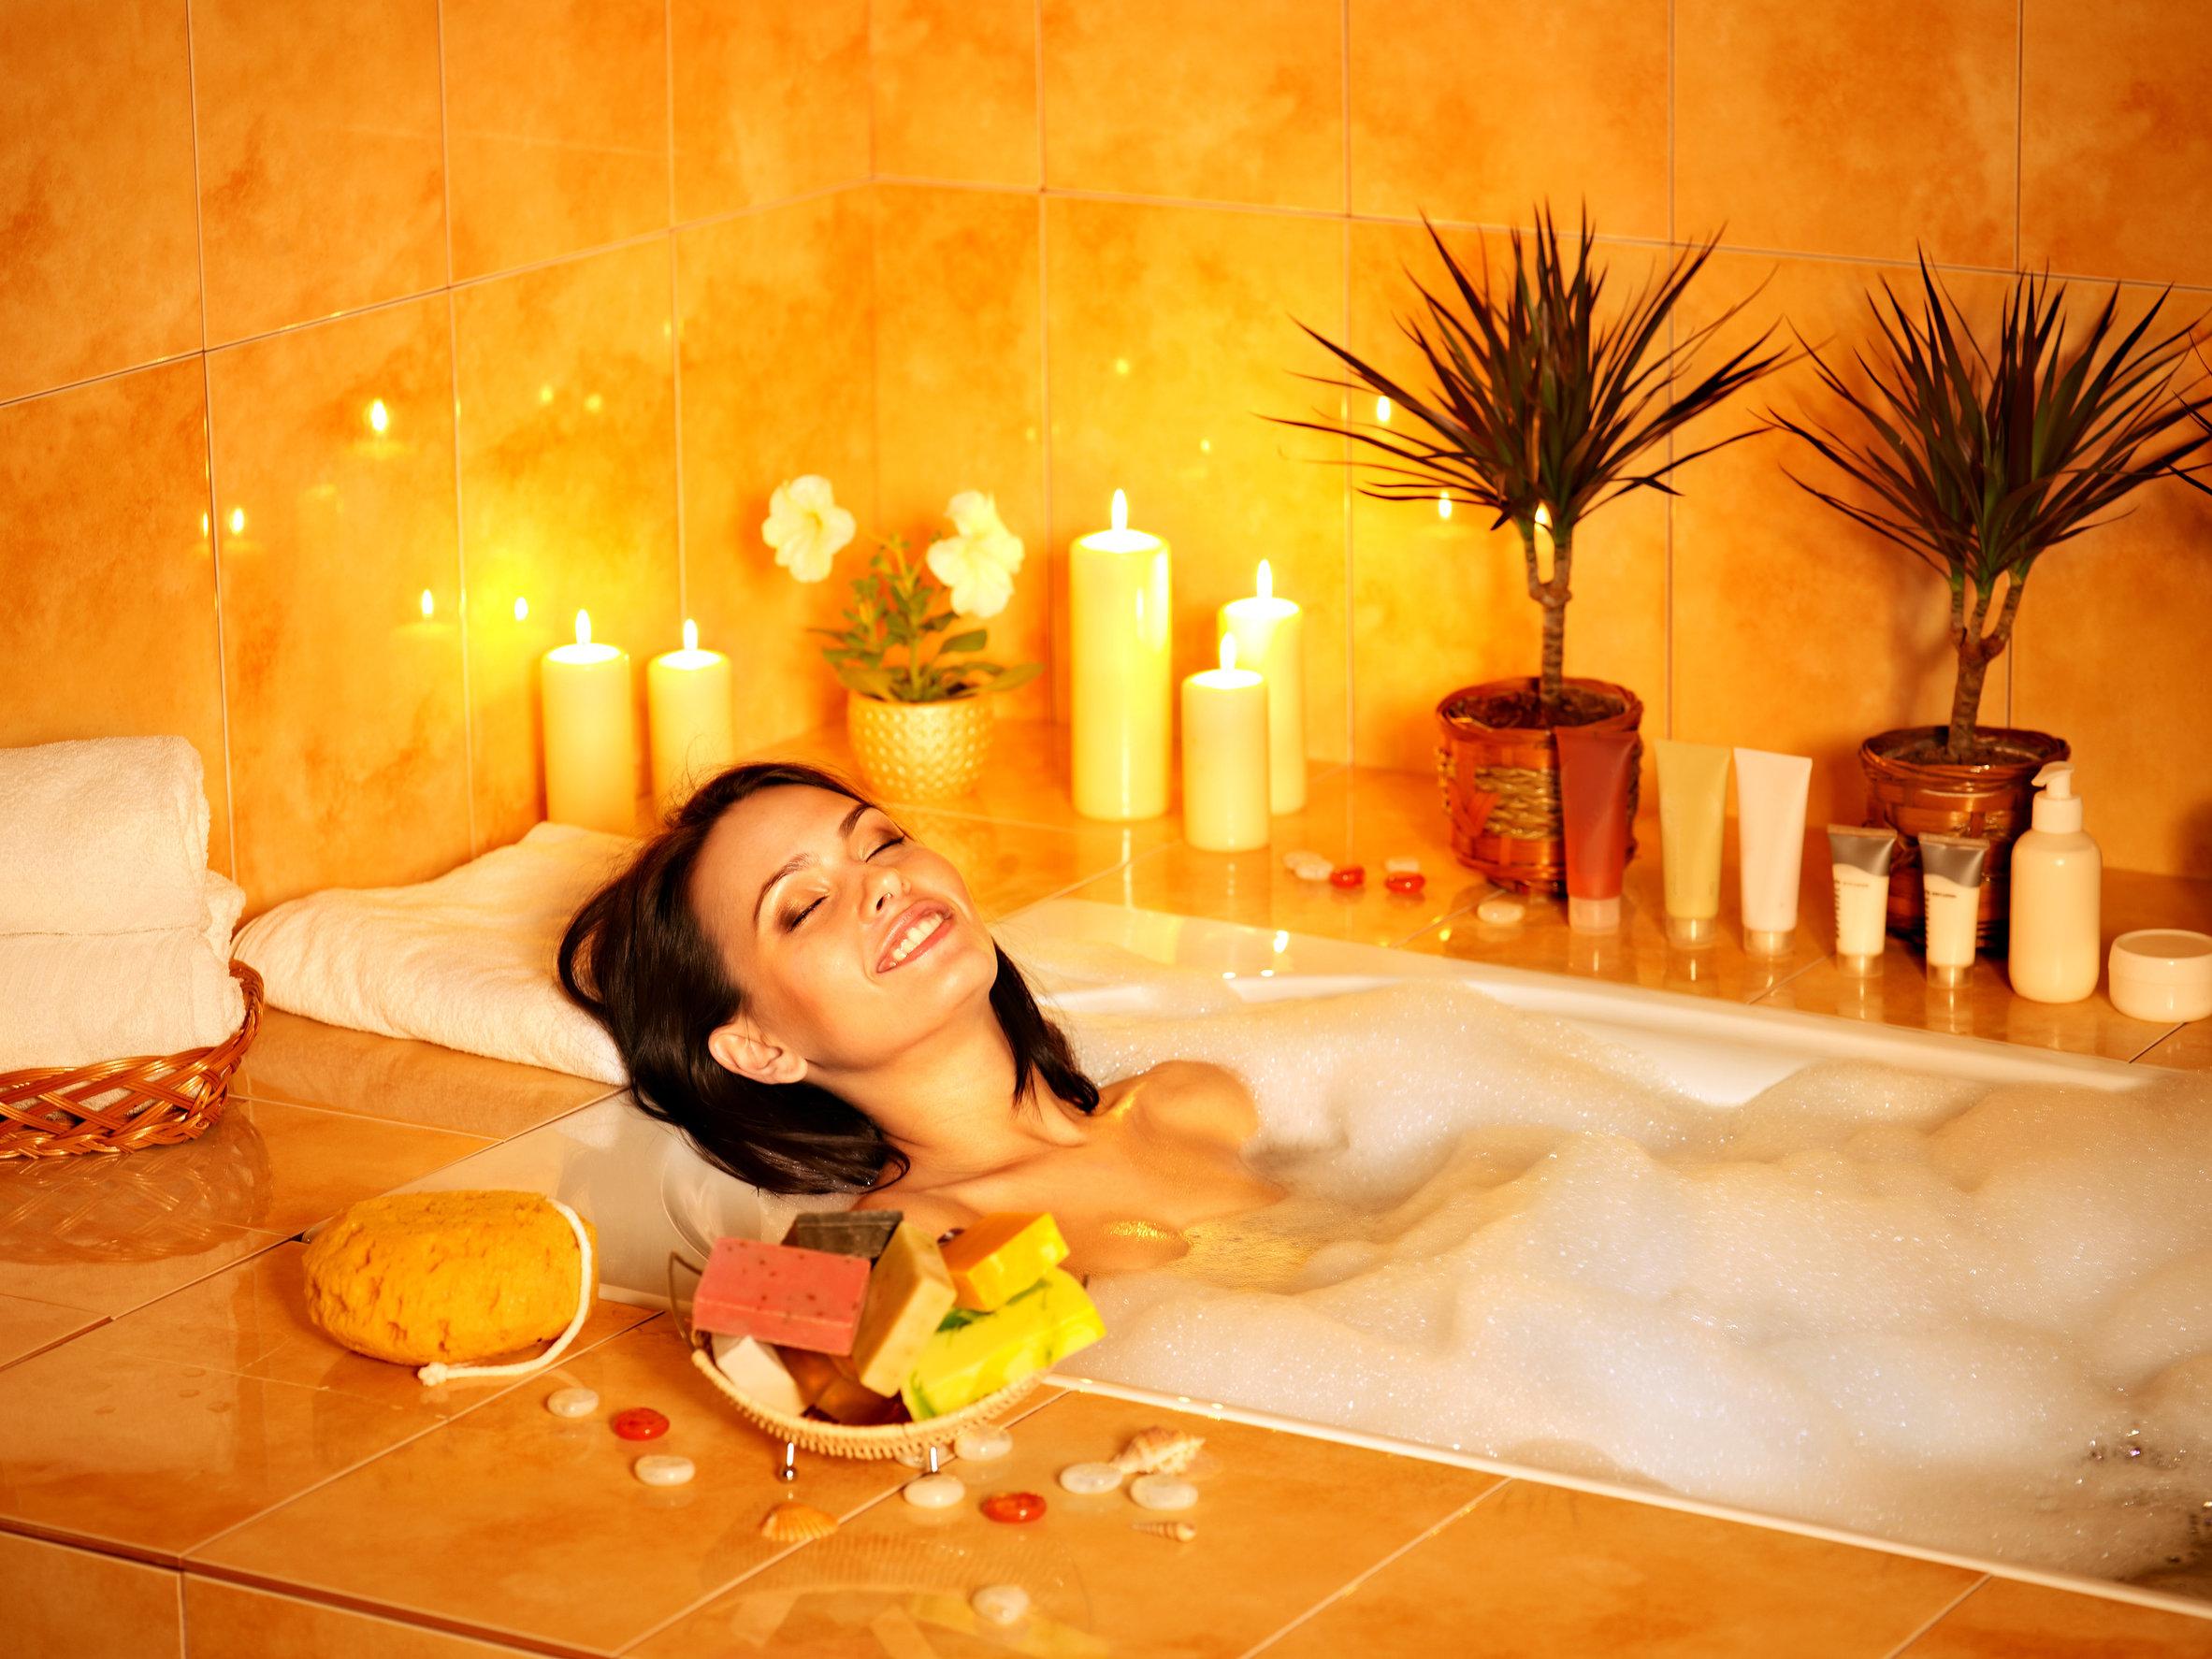 Mujer tomando un baño de agua caliente